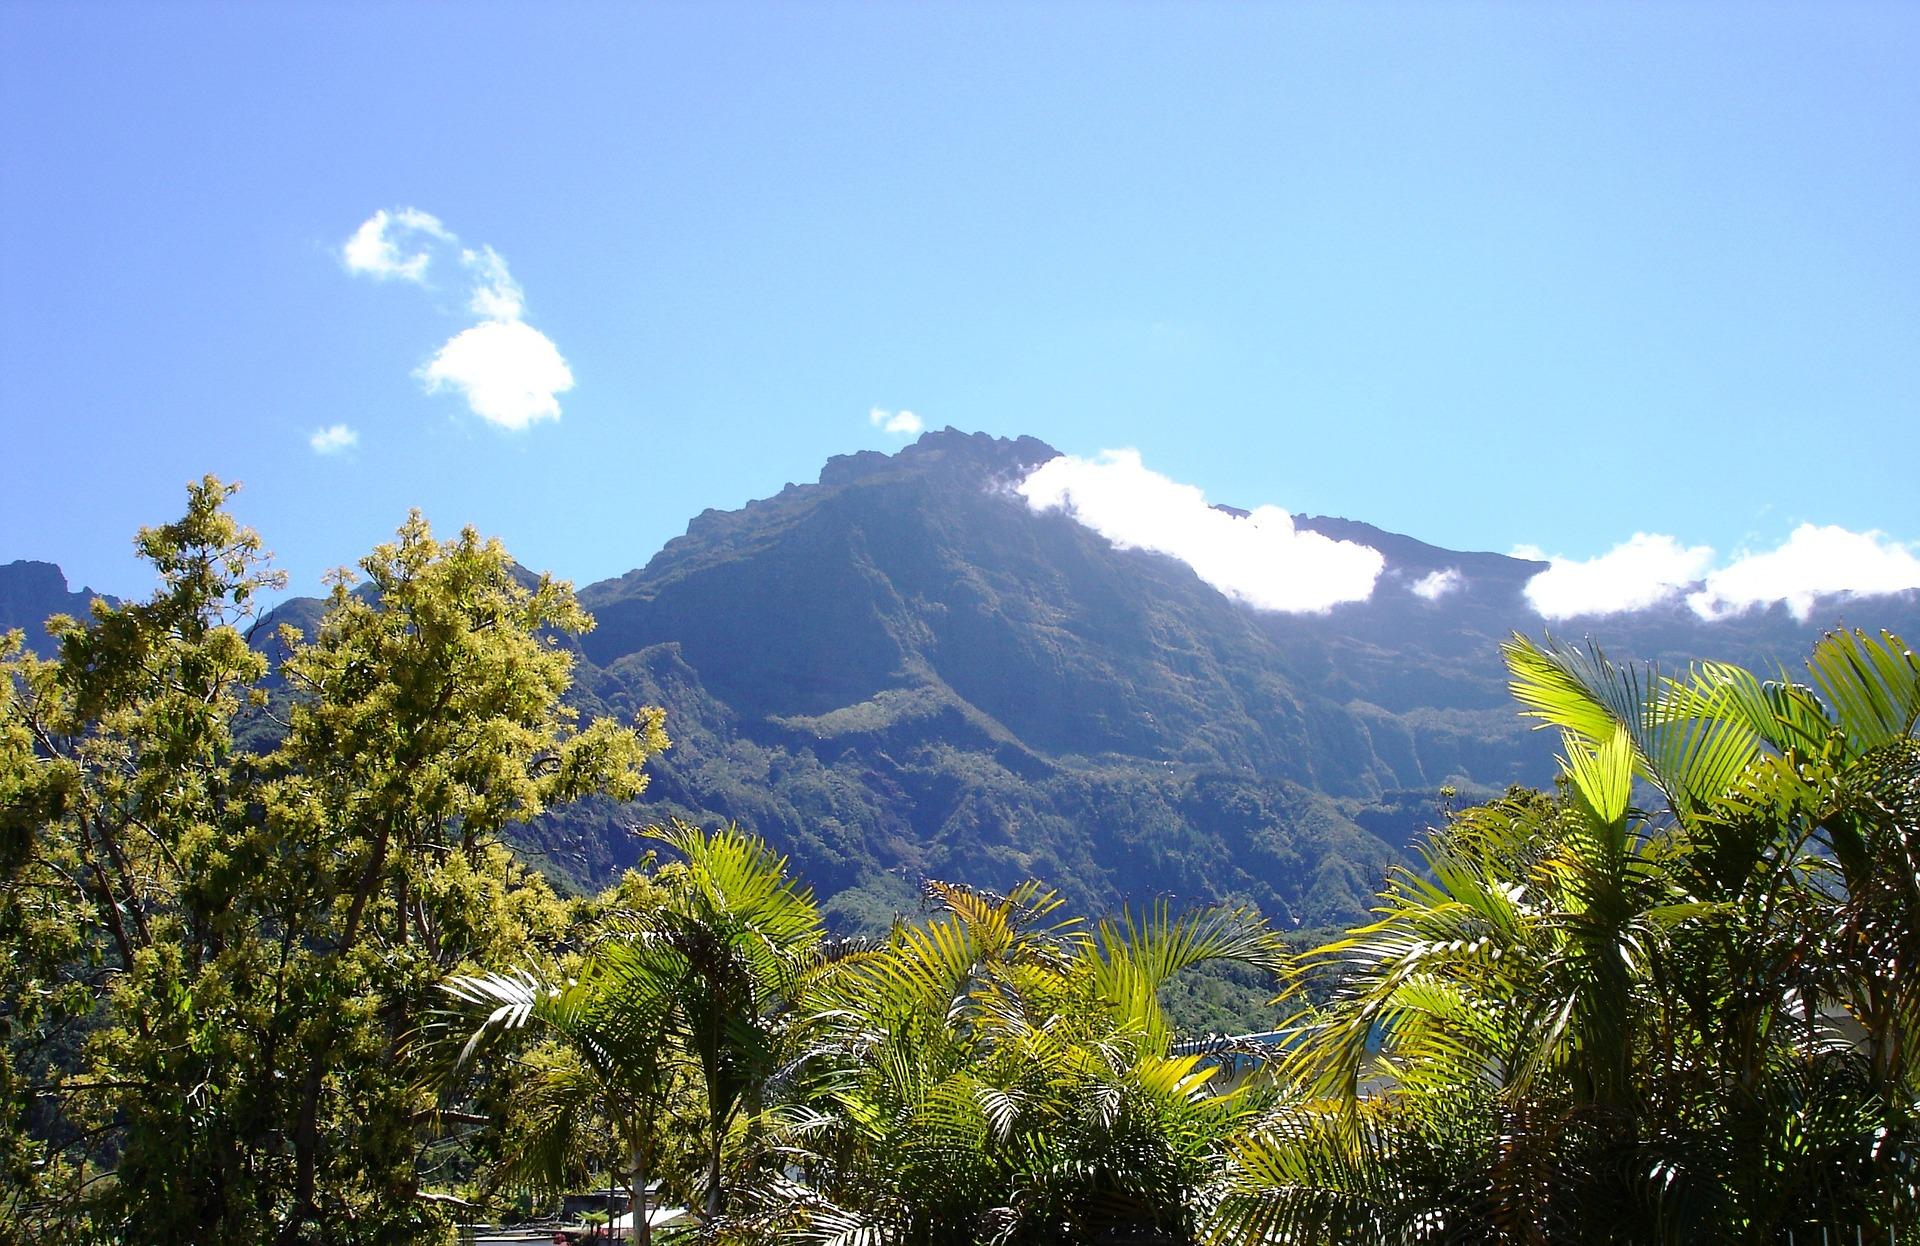 mountain-1287604_1920.jpg